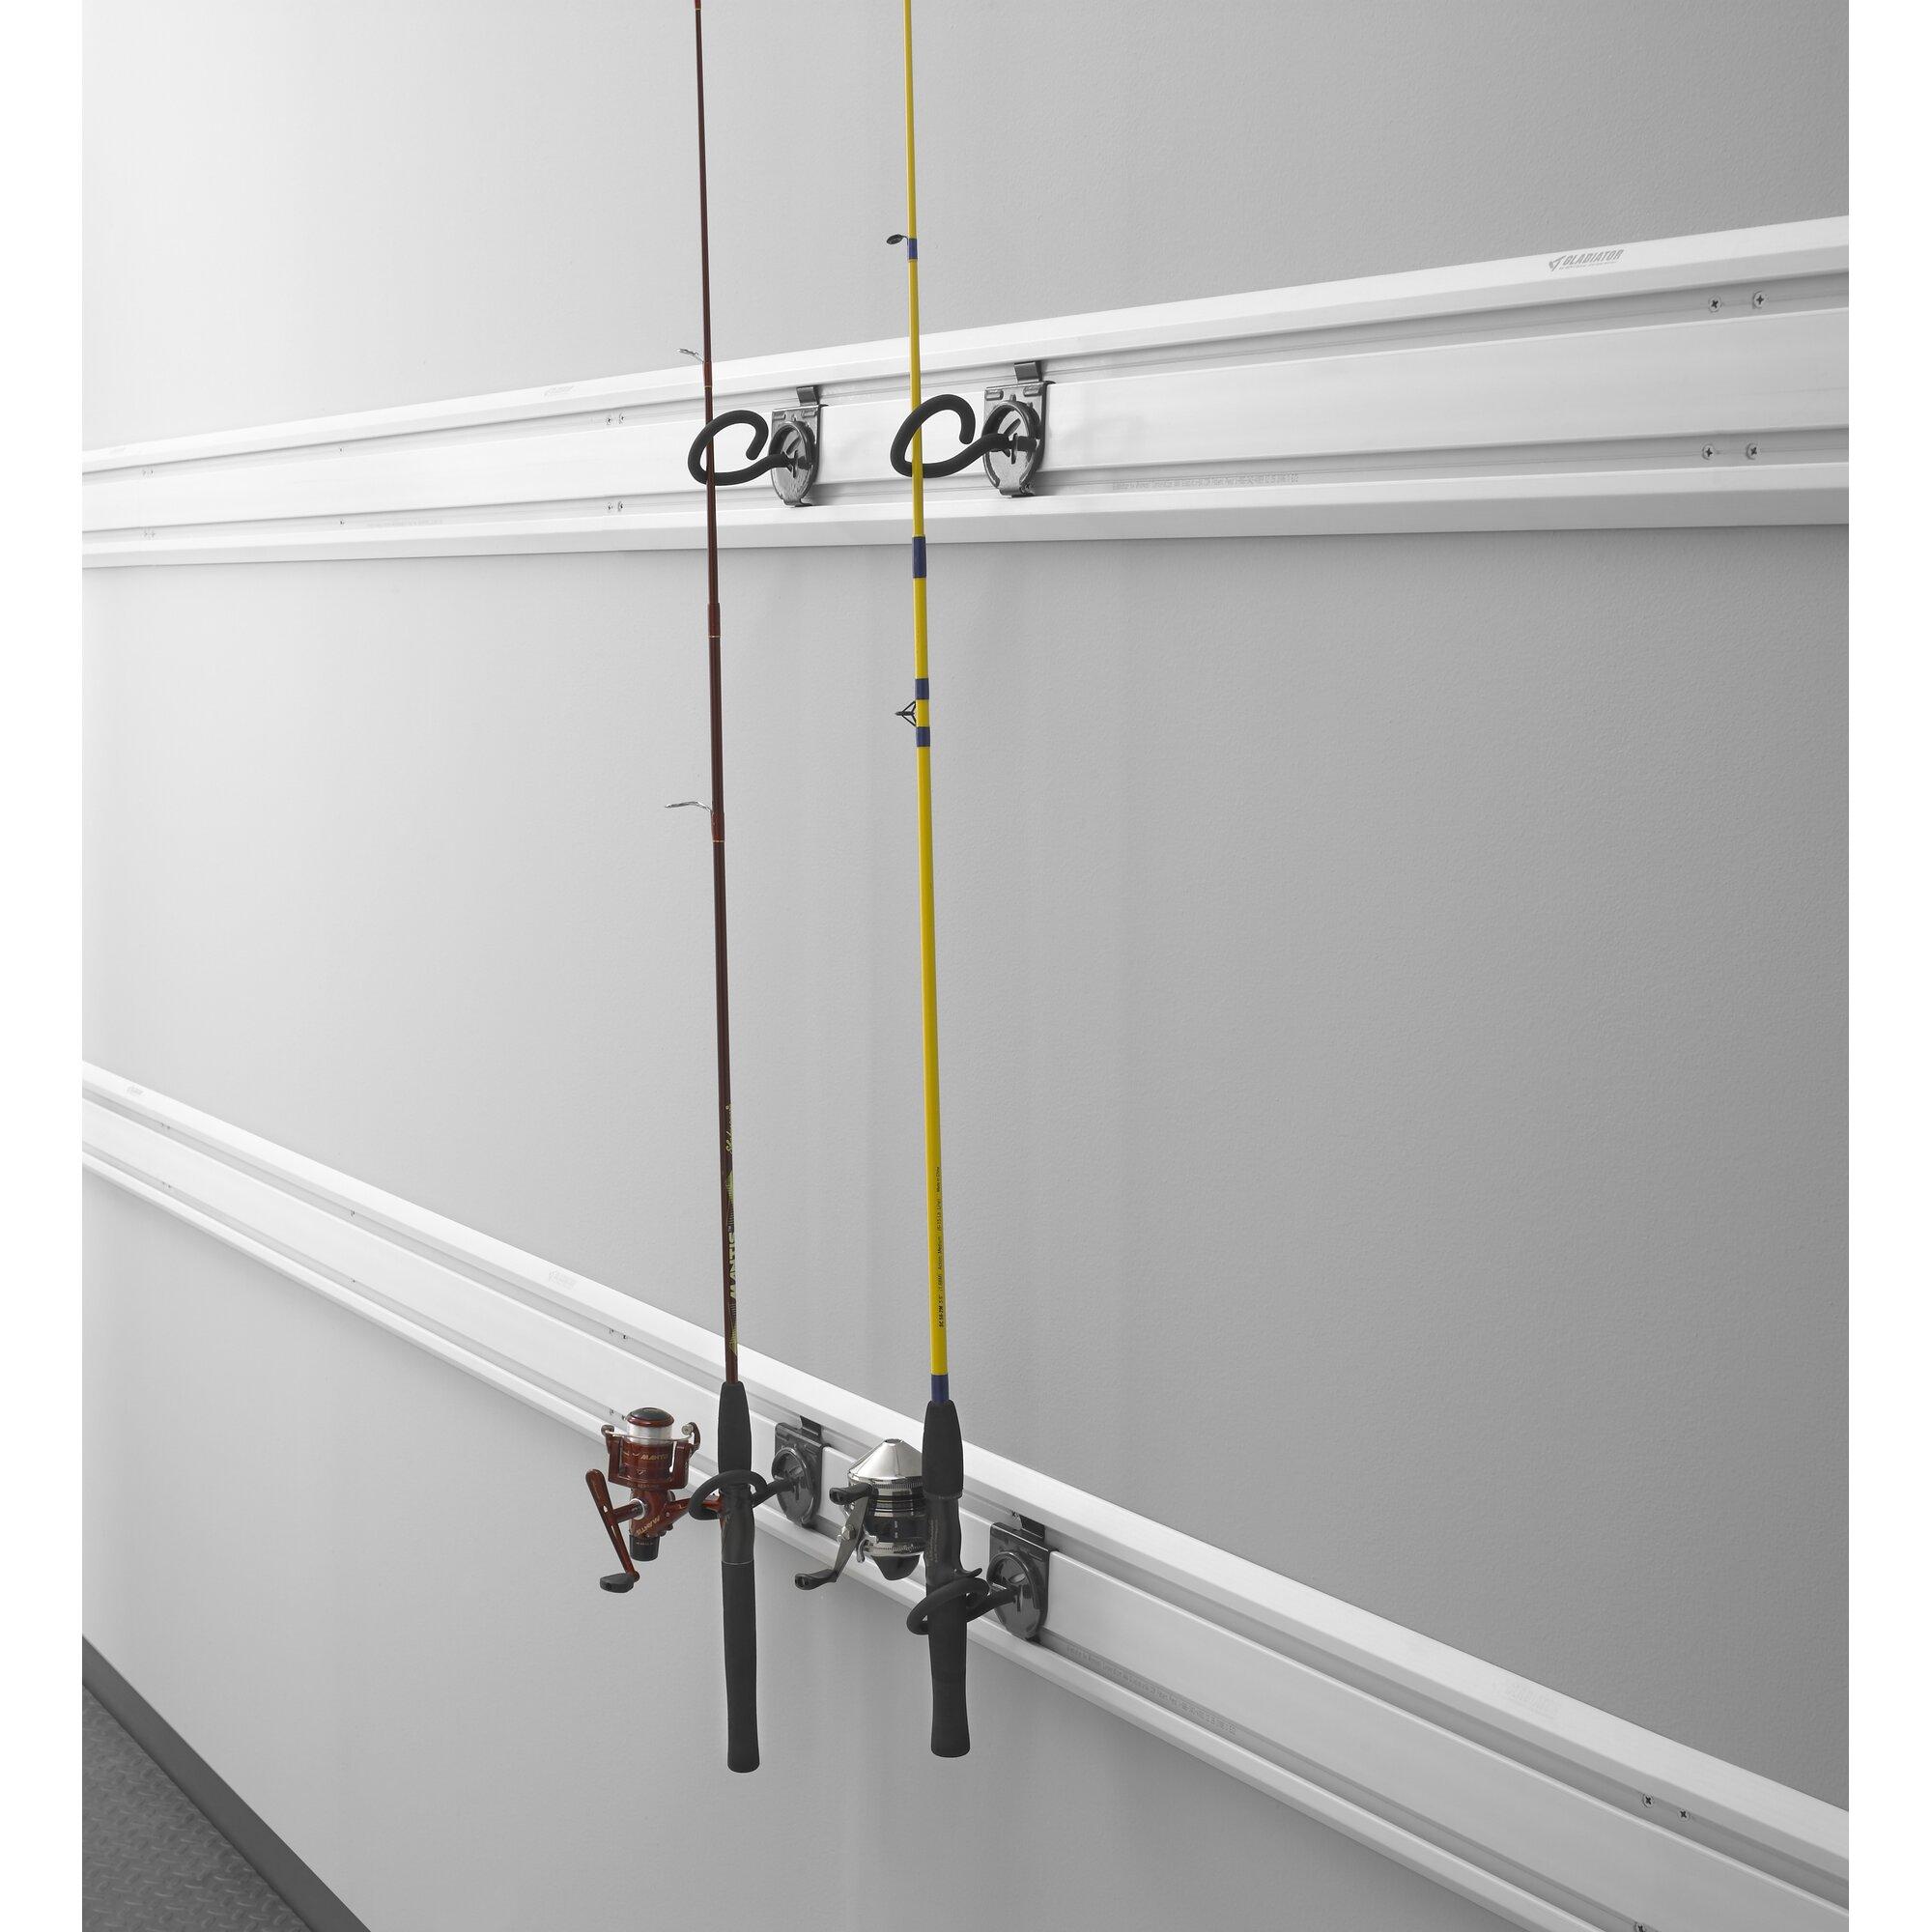 Gladiator fishing pole holder garage hook wall mounted for Wall mount fishing pole holder